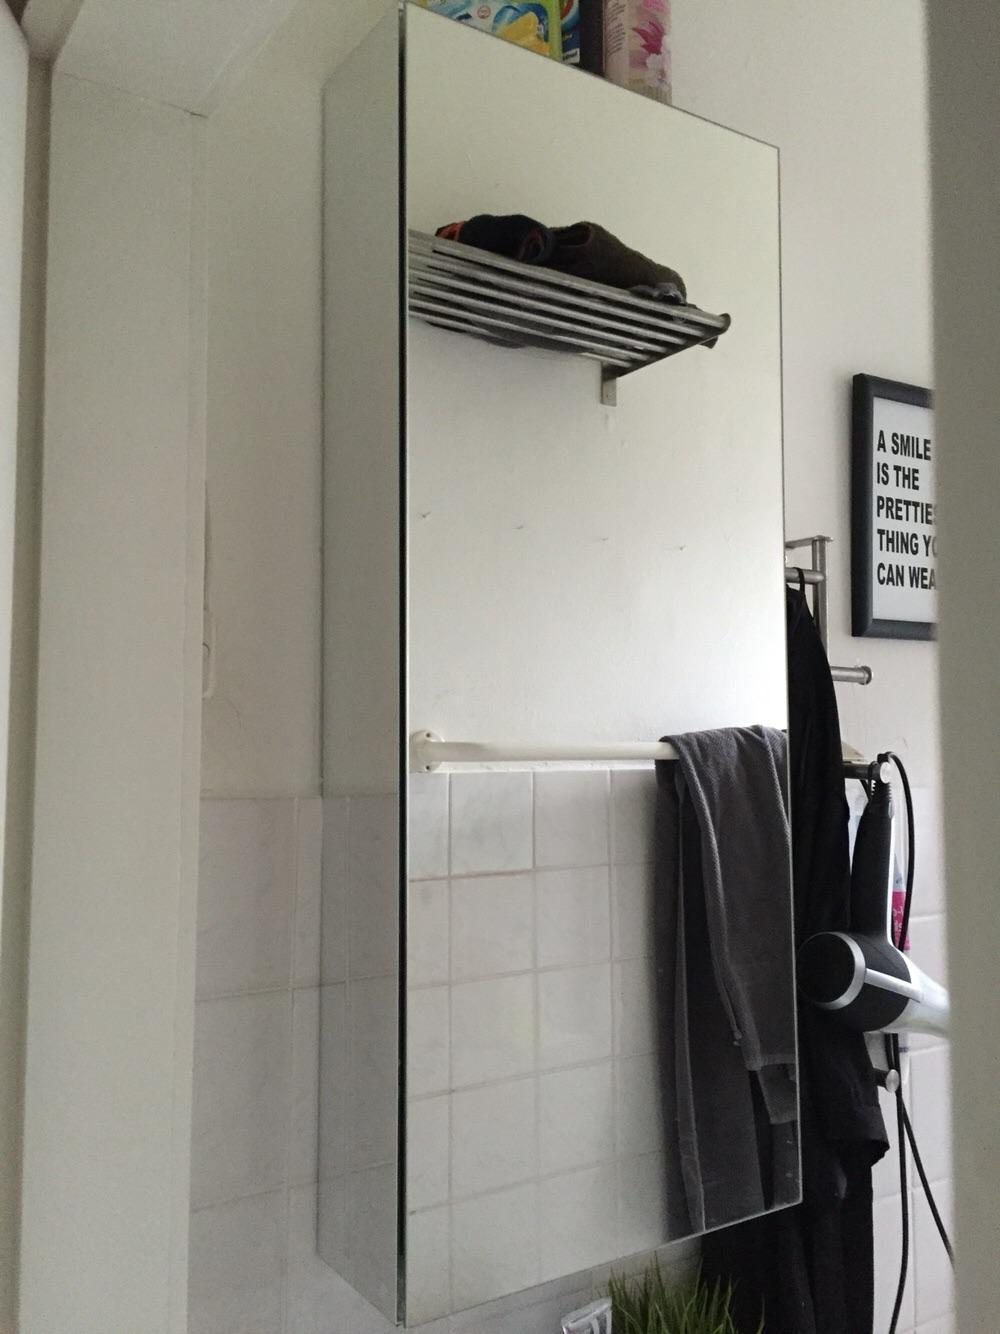 Gebraucht IKEA Badezimmer Spiegelschrank GODMORGON In 47799 Krefeld Um U20ac  80.00 U2013 Shpock